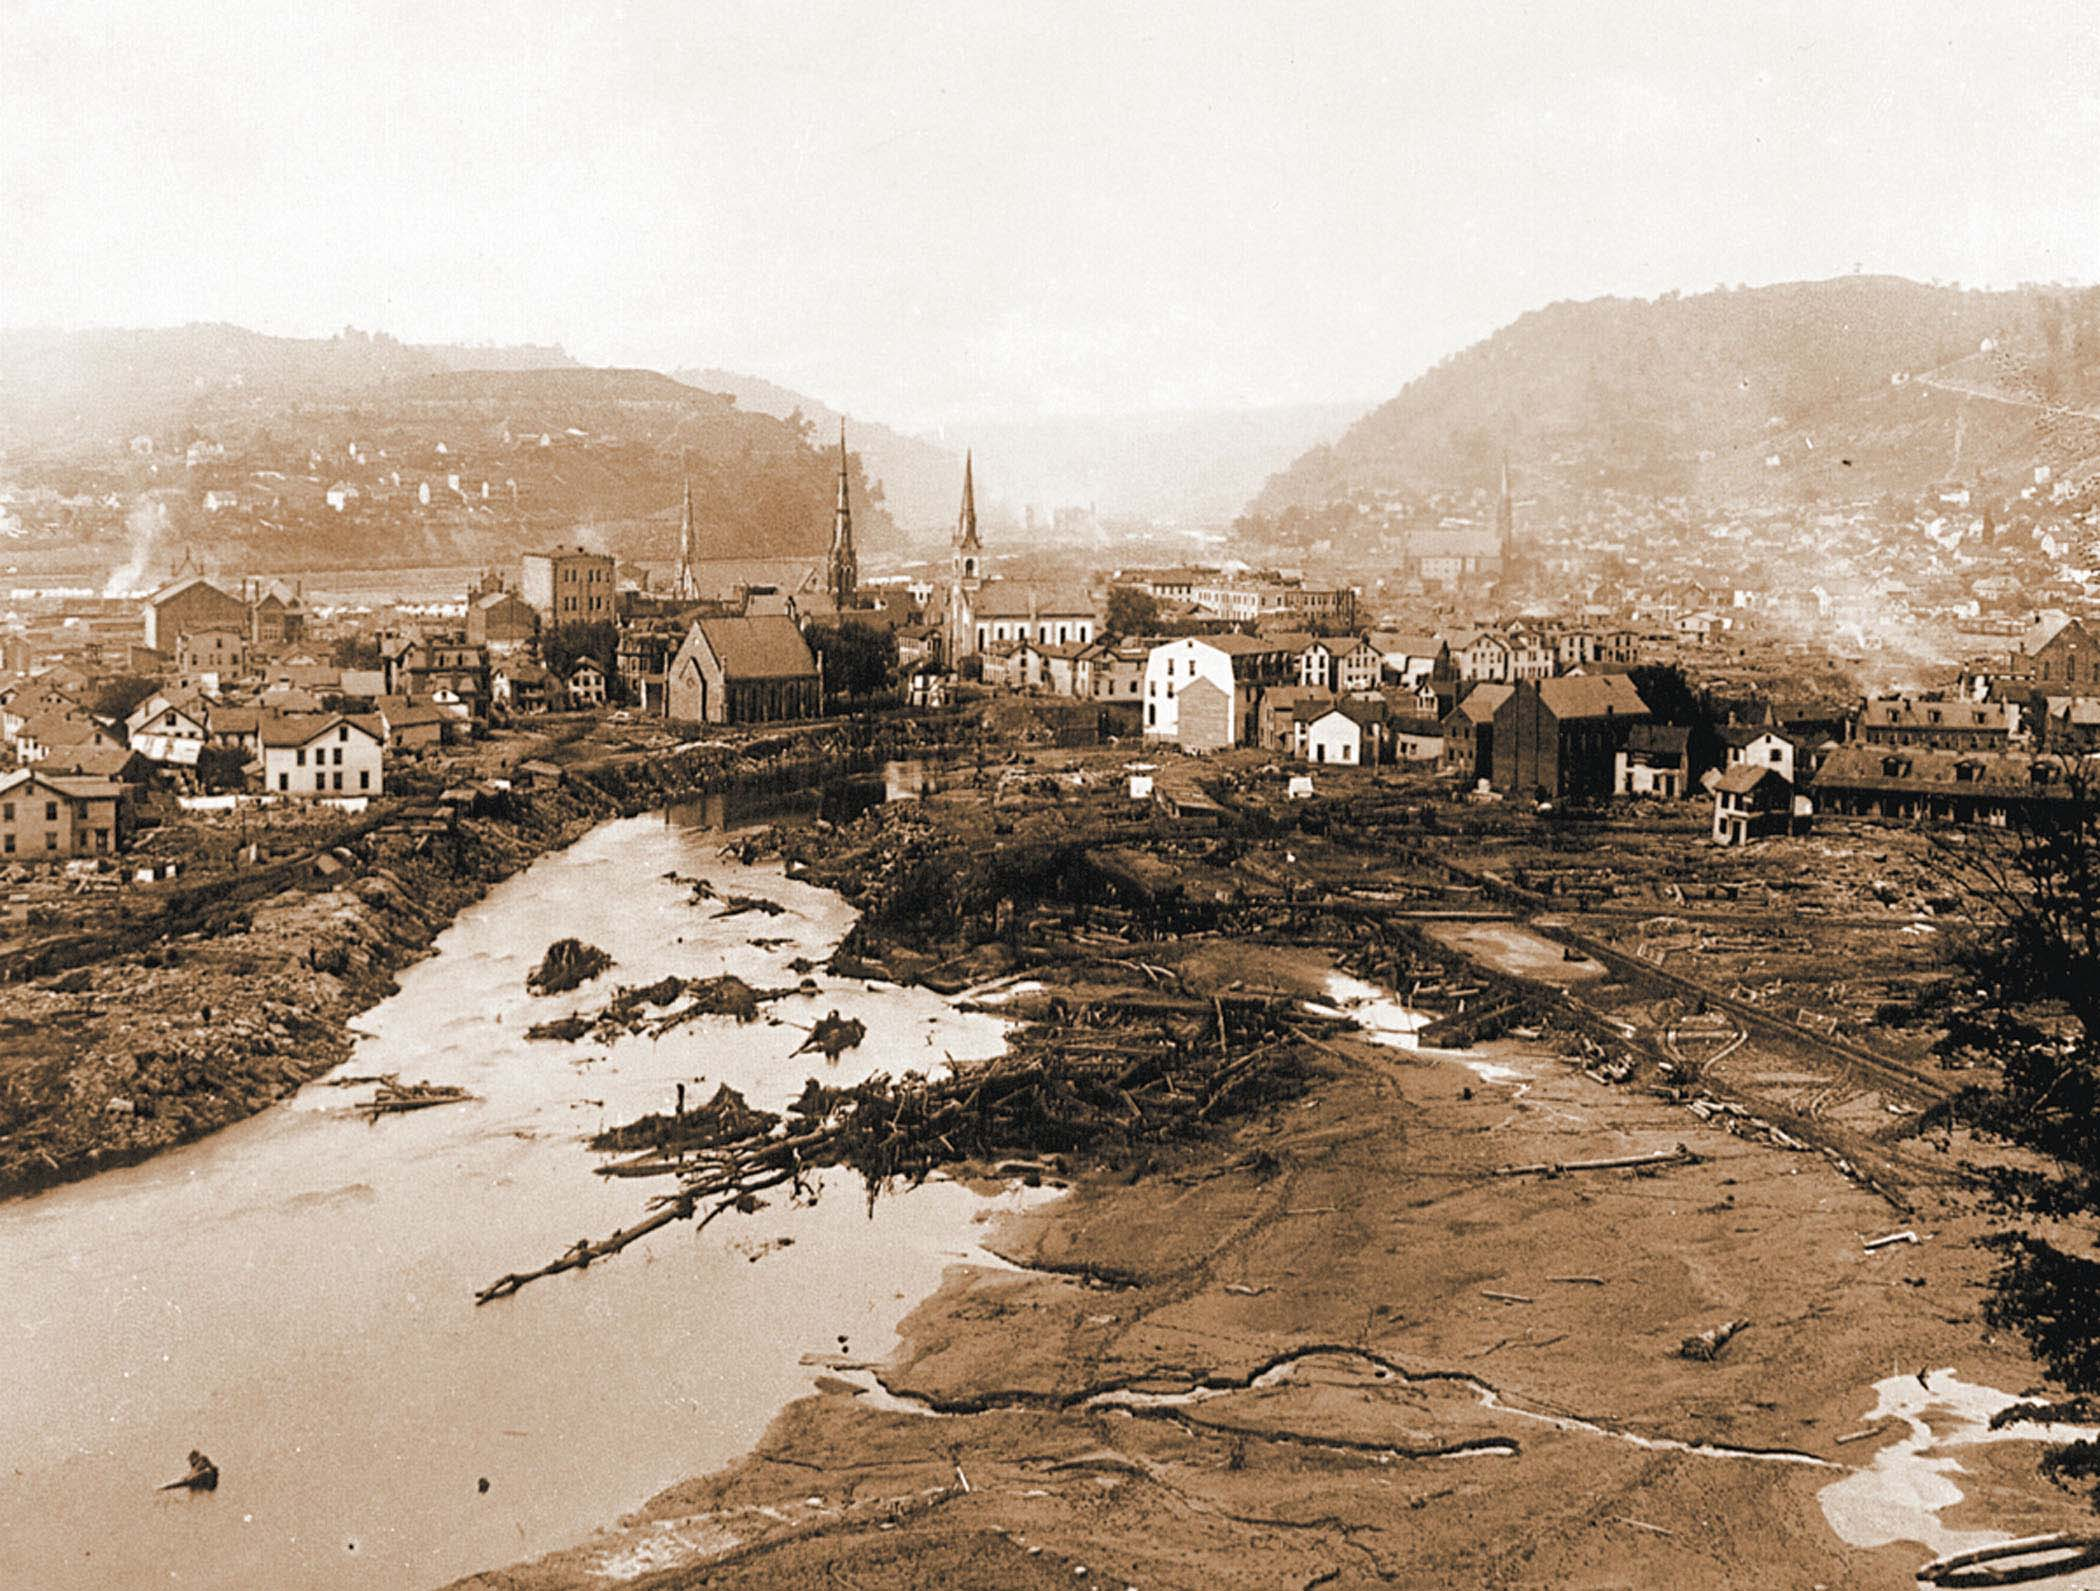 Visit Johnstown - The Johnstown Flood